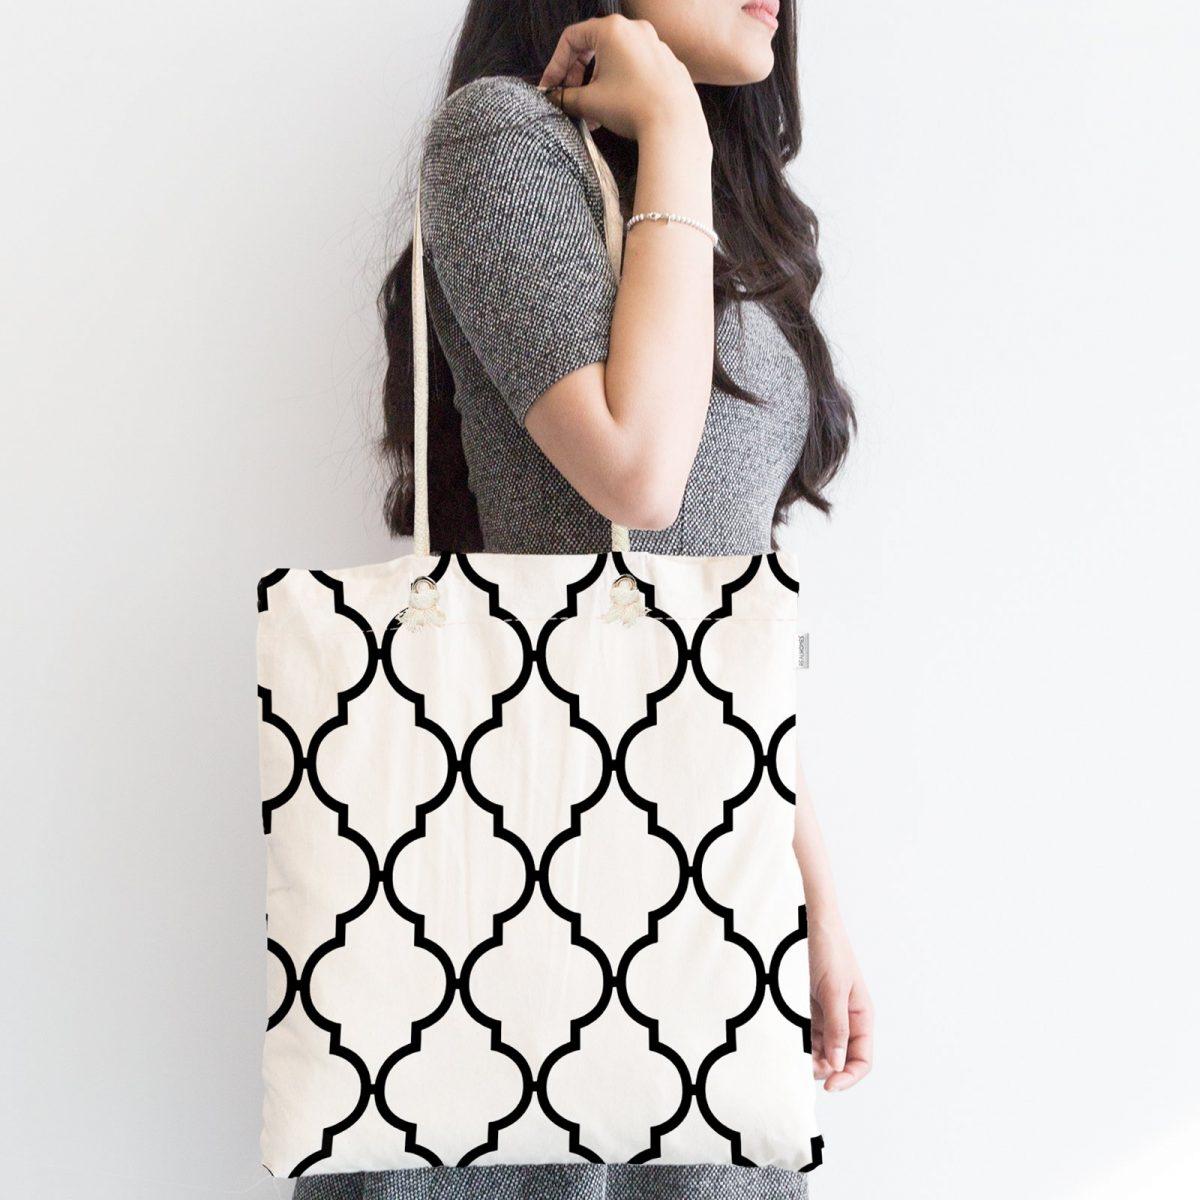 Siyah Beyaz Ogea Desenli Fermuarlı Modern Kumaş Çanta Realhomes